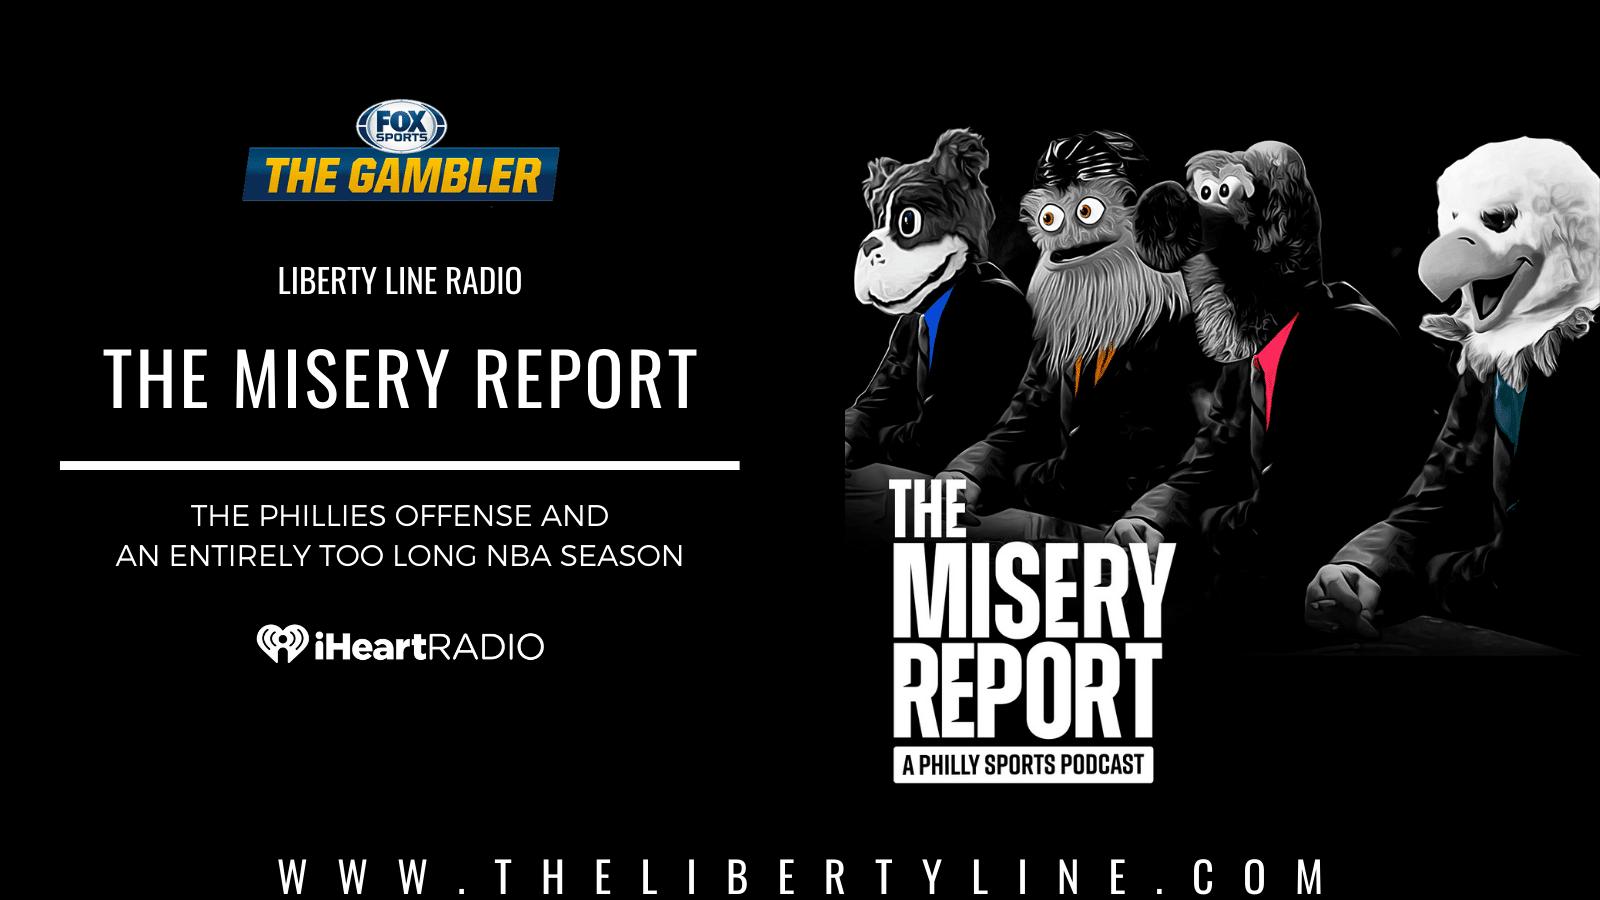 thelibertyline.com - Drew Smith Leader of DSGN Tree. Cofounder of The Liberty Line. Cohost of TMR. - Liberty Line Radio: The Misery Report